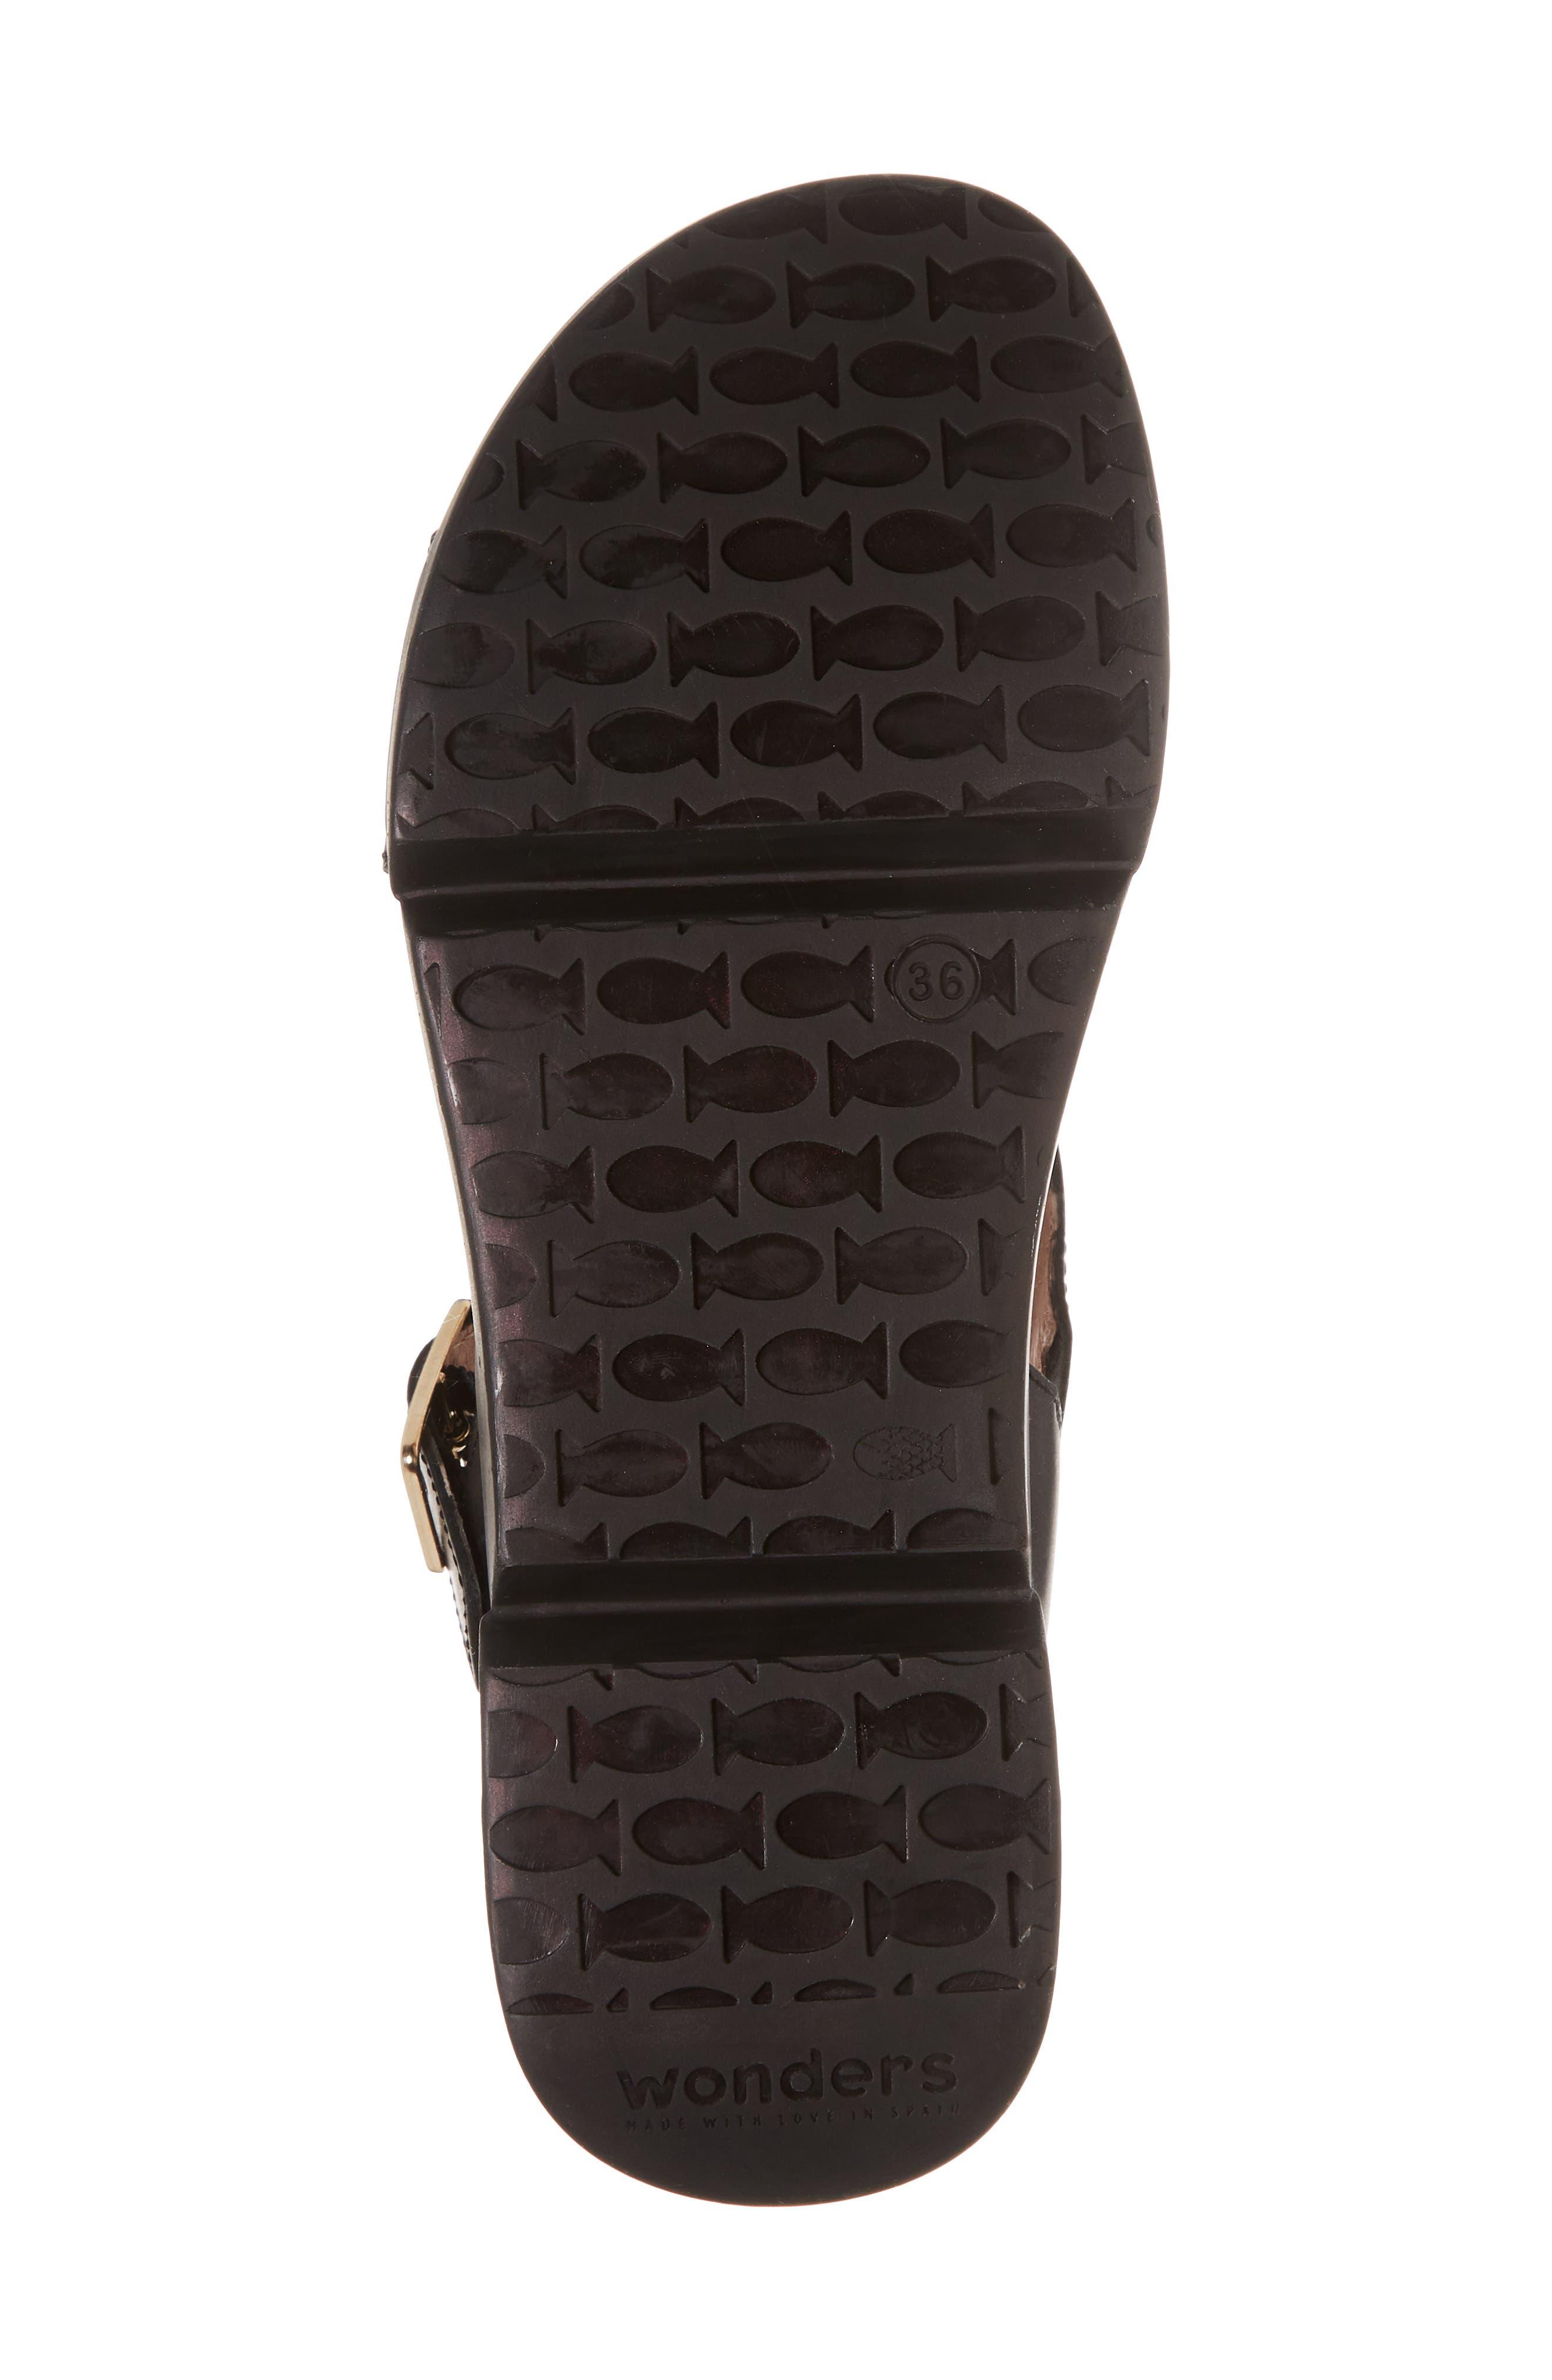 Platform Wedge Sandal,                             Alternate thumbnail 6, color,                             Black Leather